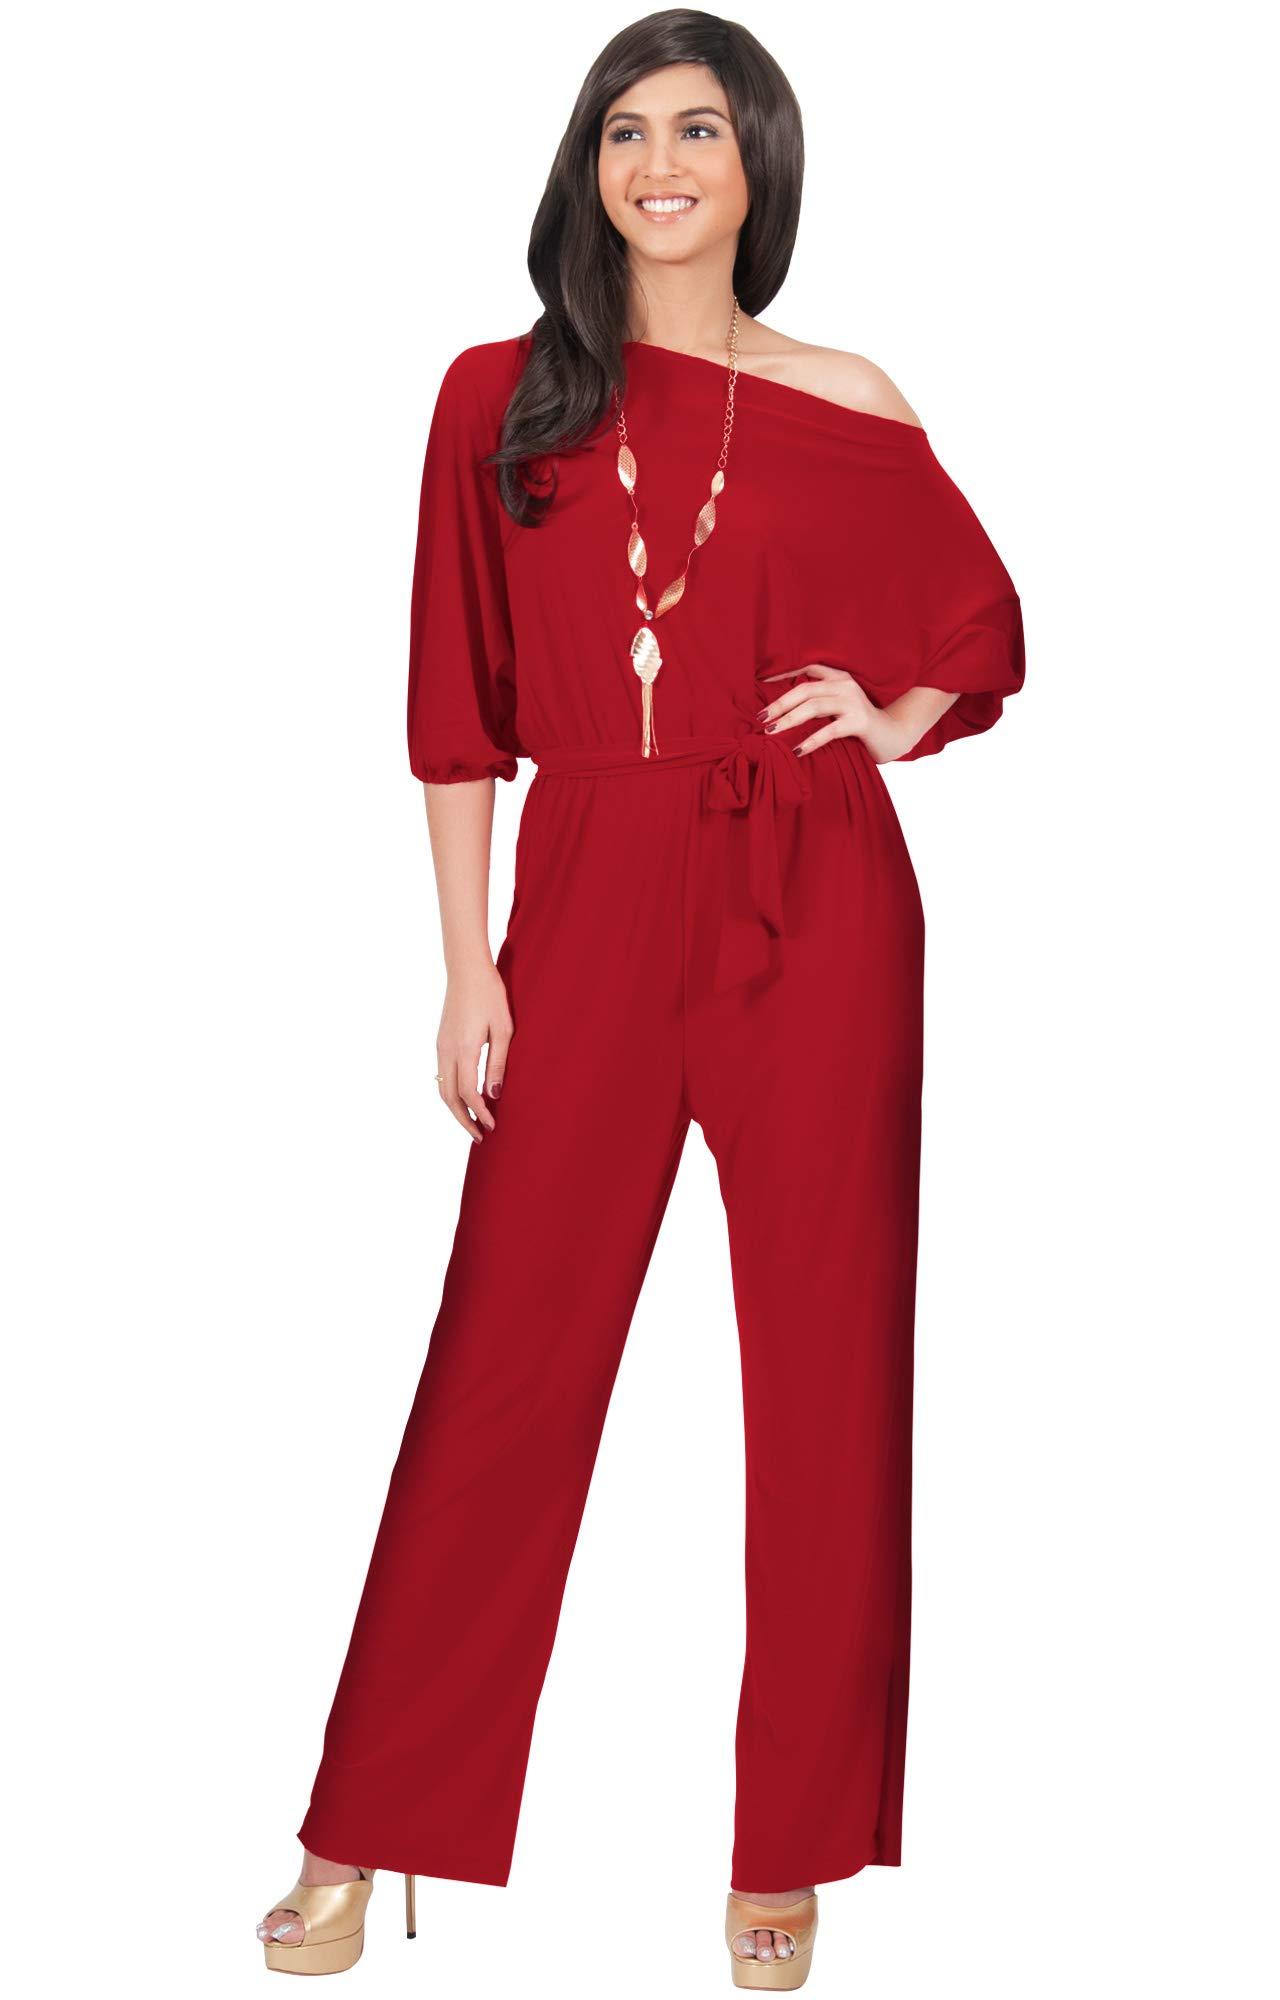 6acc3fabdd2eb KOH KOH Womens One Shoulder Short Sleeve Sexy Wide Leg Long Pants One Piece Jumpsuit  Jumpsuits Pant Suit Suits Romper Rompers Playsuit Playsuits, Red M 8-10